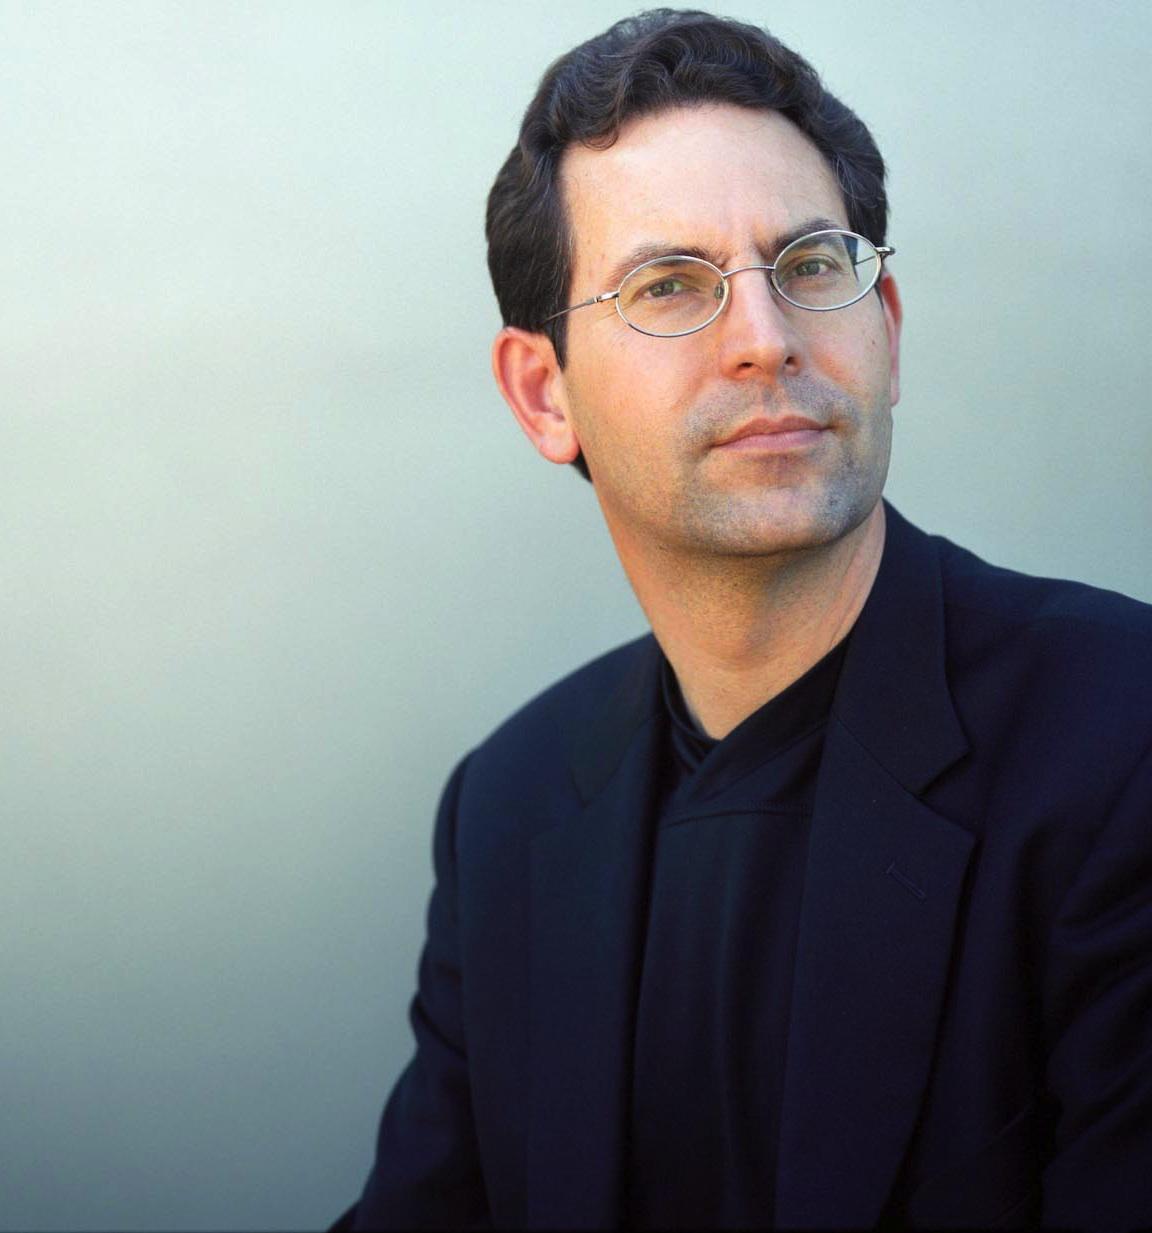 John Halamka, CIO of Beth Israel Deaconess Medical Center